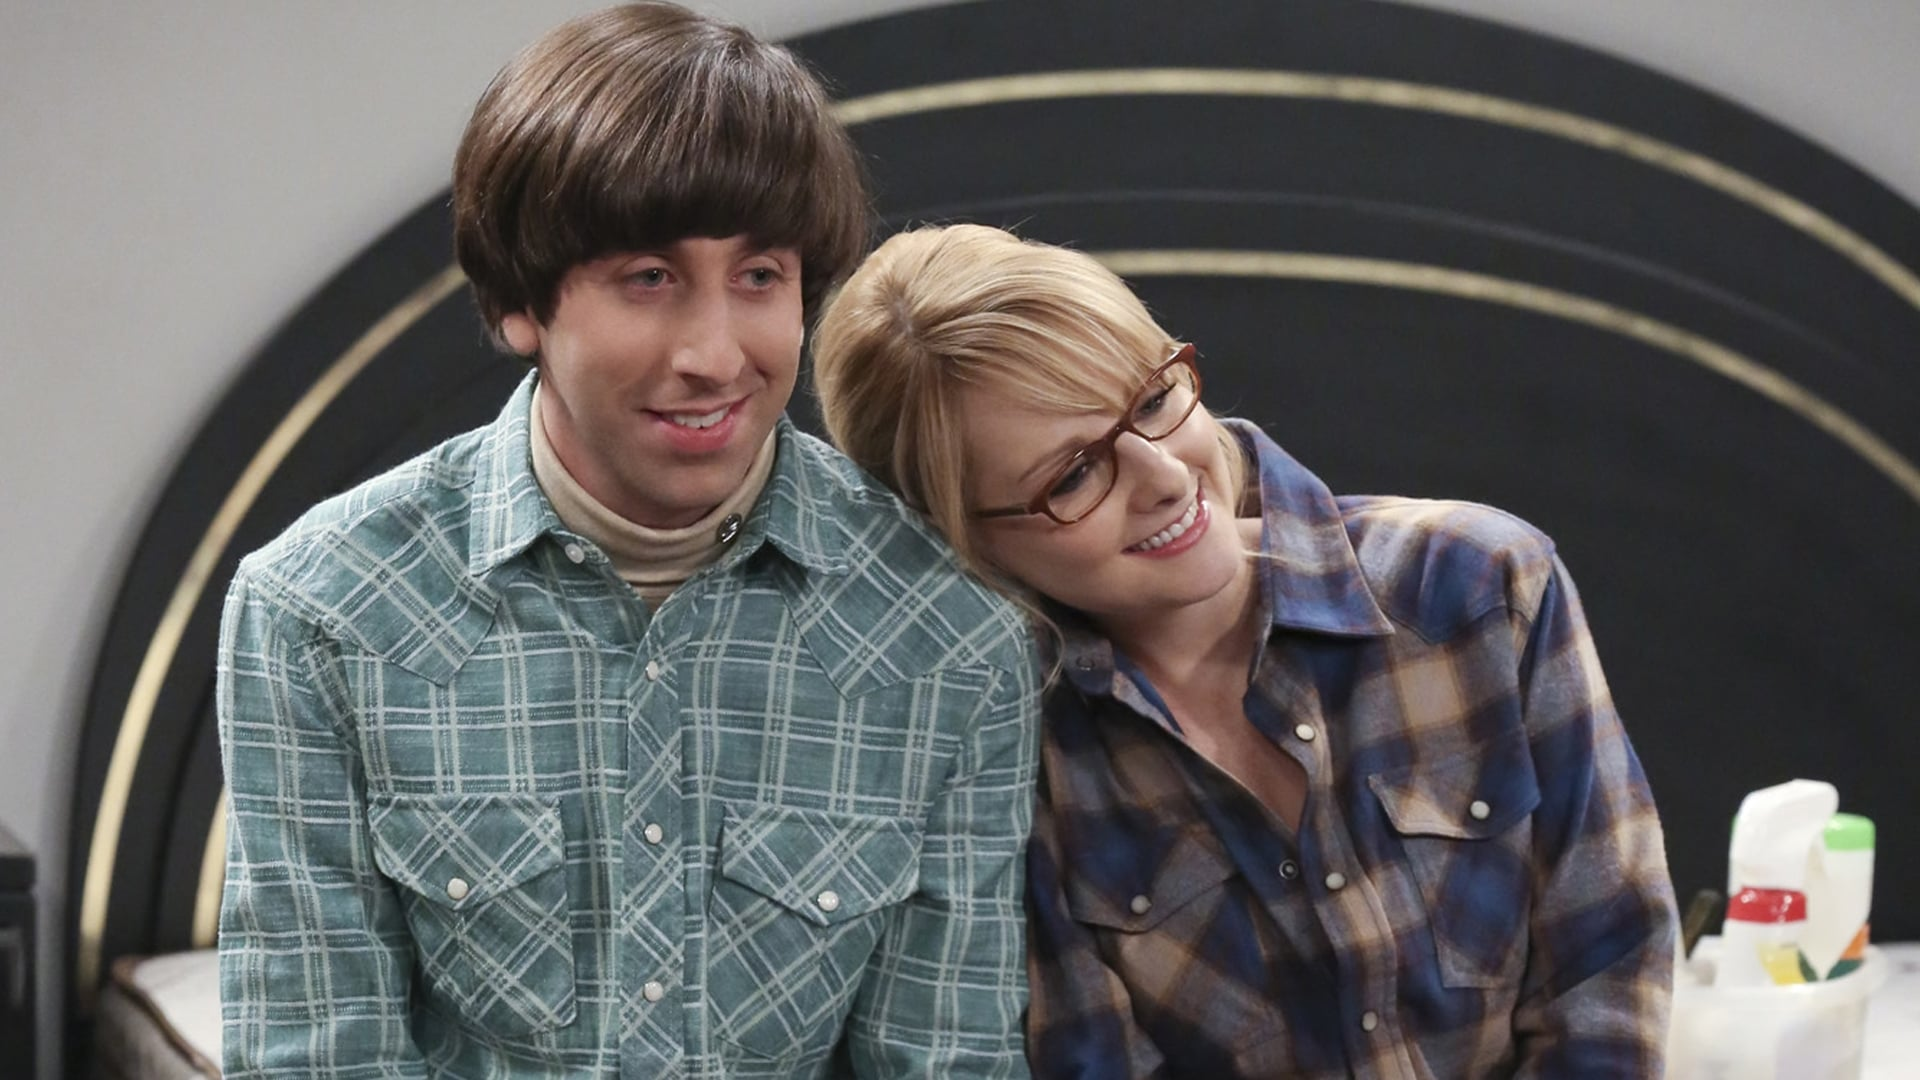 The Big Bang Theory - Season 9 Episode 12 : The Sales Call Sublimation